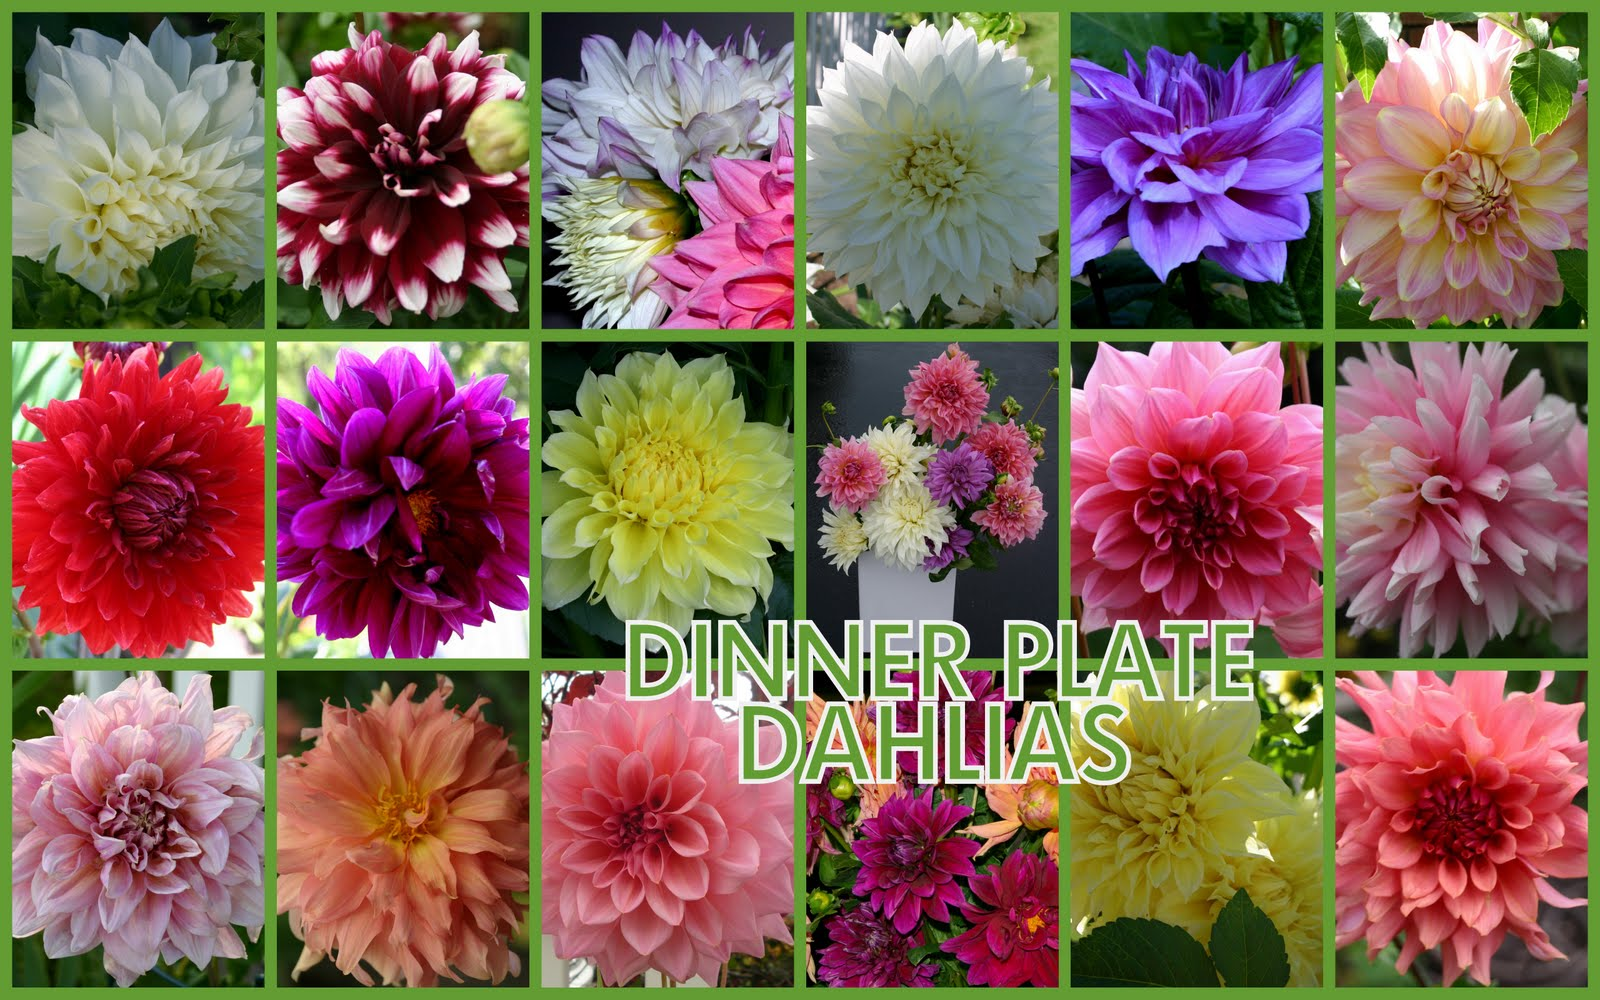 Dinner plate dahlias sowing the seeds dinner plate dahlias izmirmasajfo